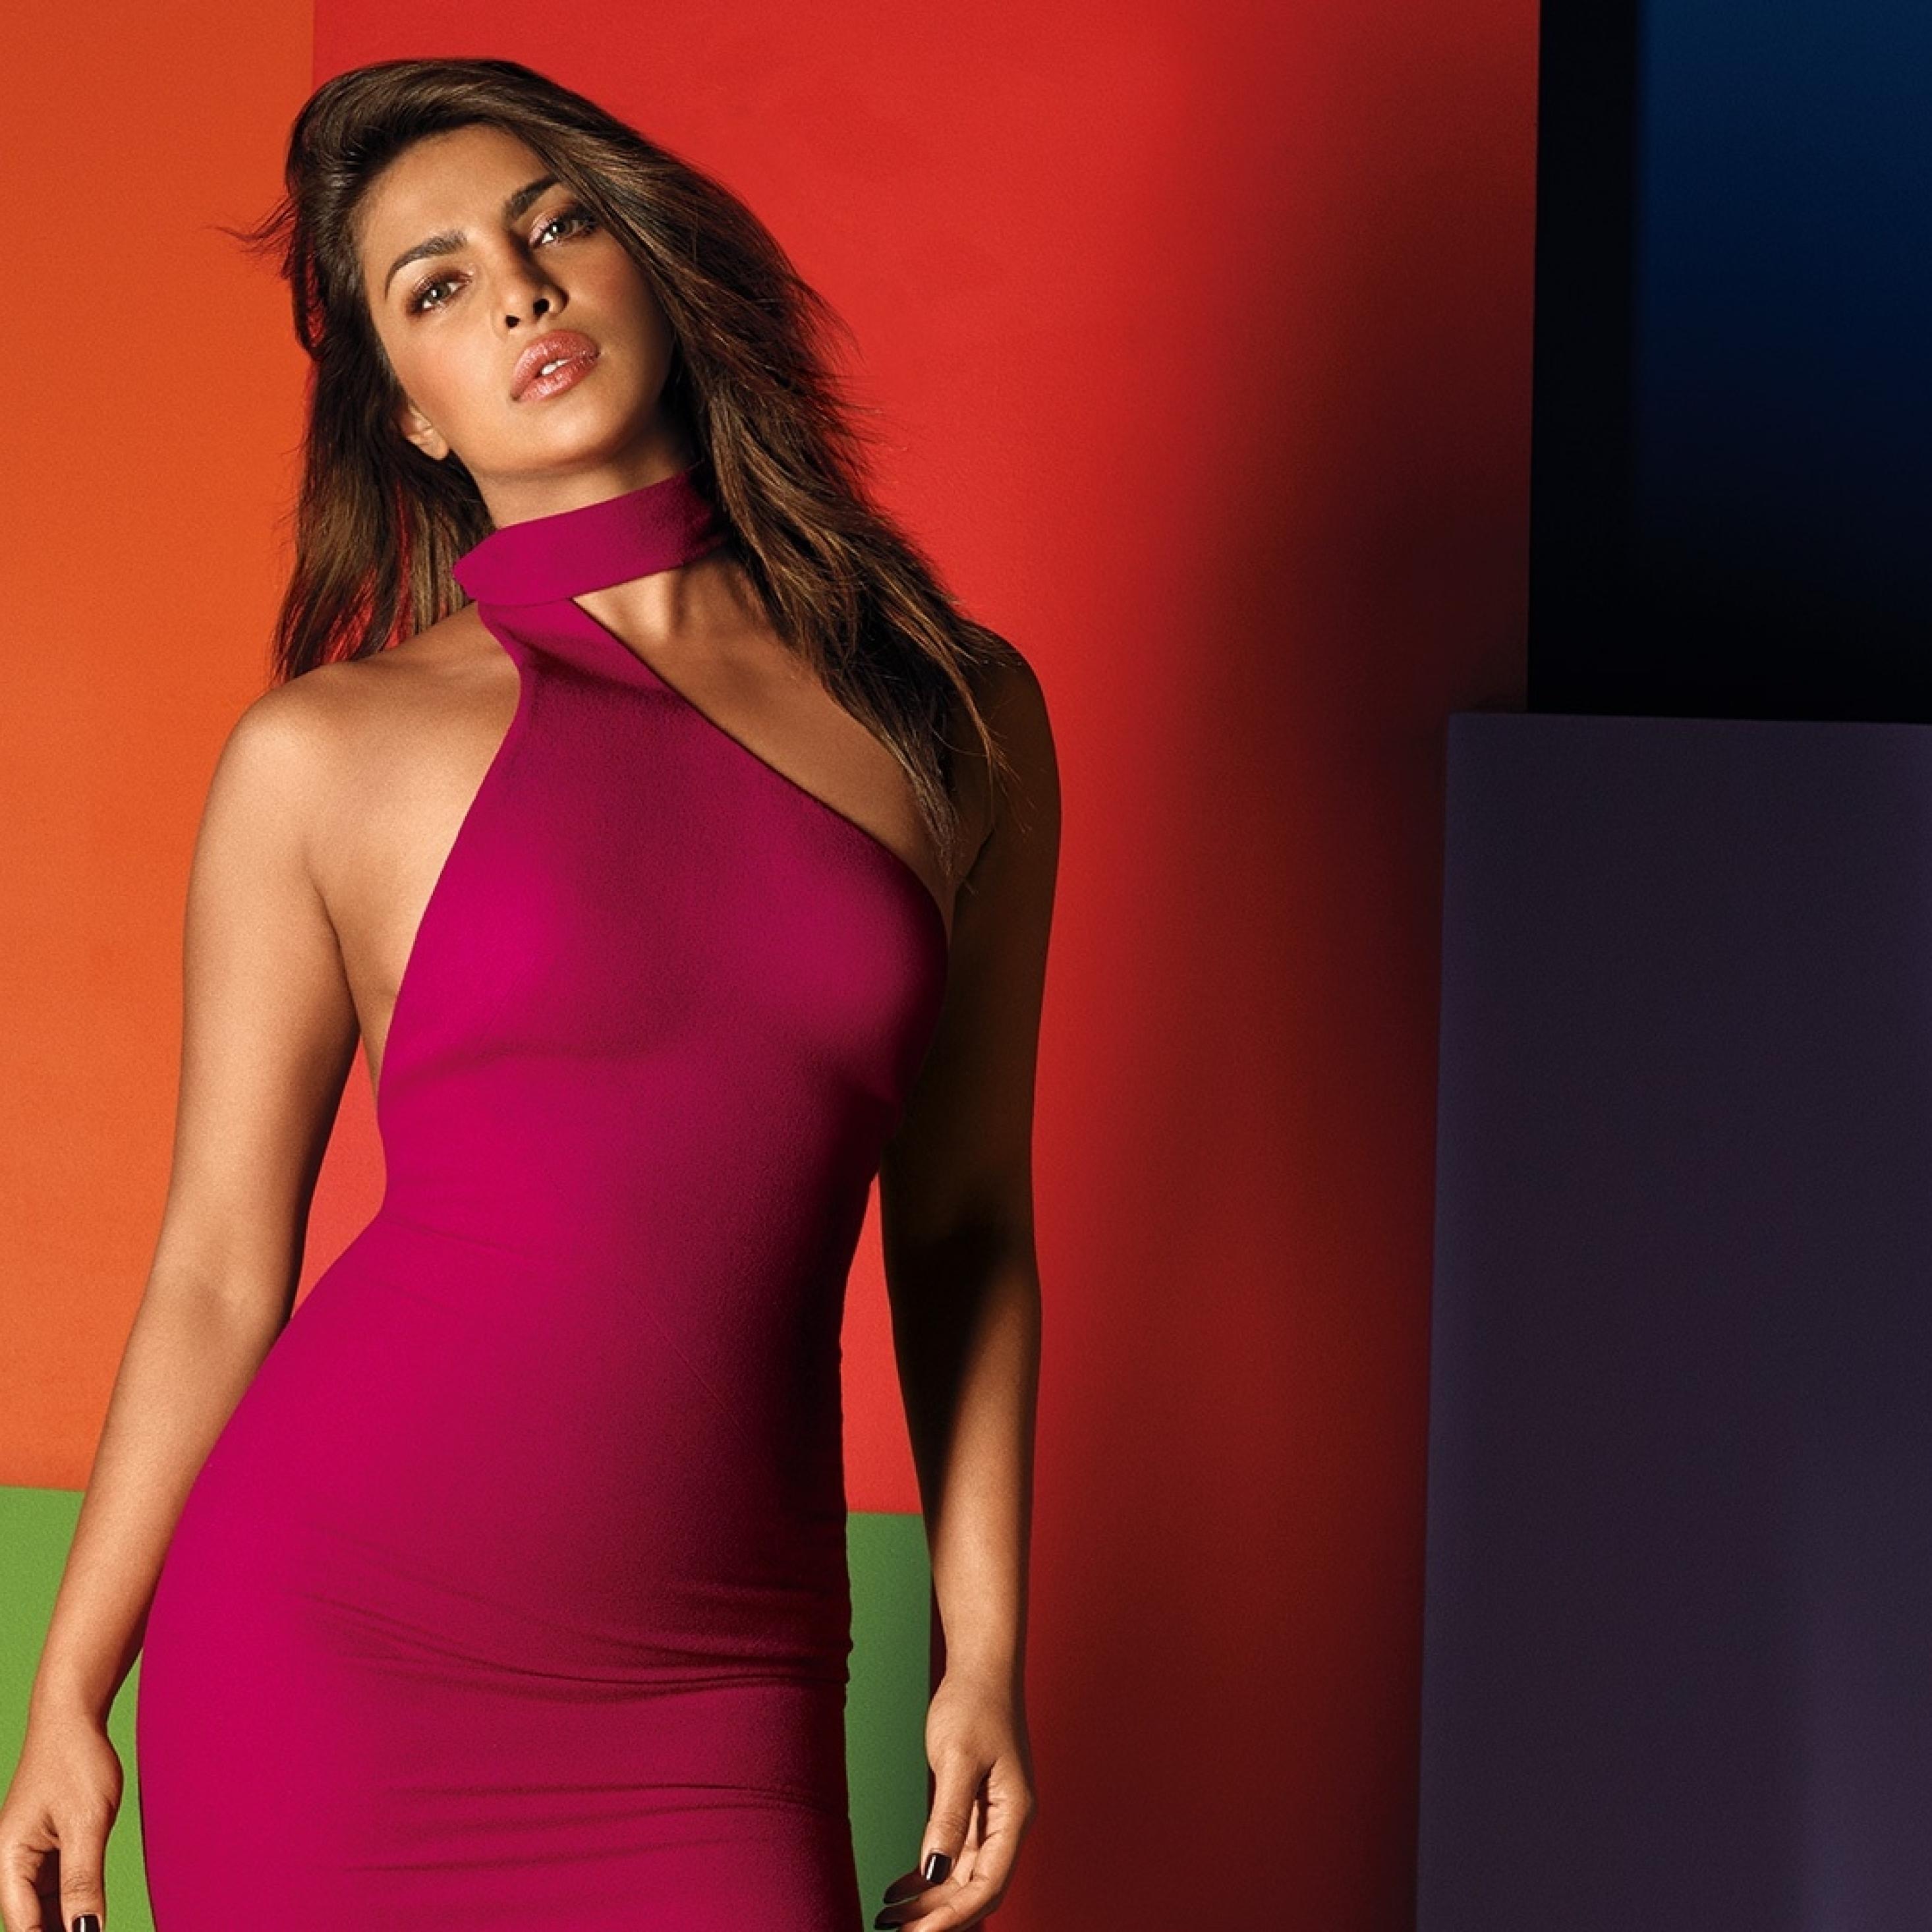 Priyanka Chopra Hot In Pink, Full Hd Wallpaper-4902